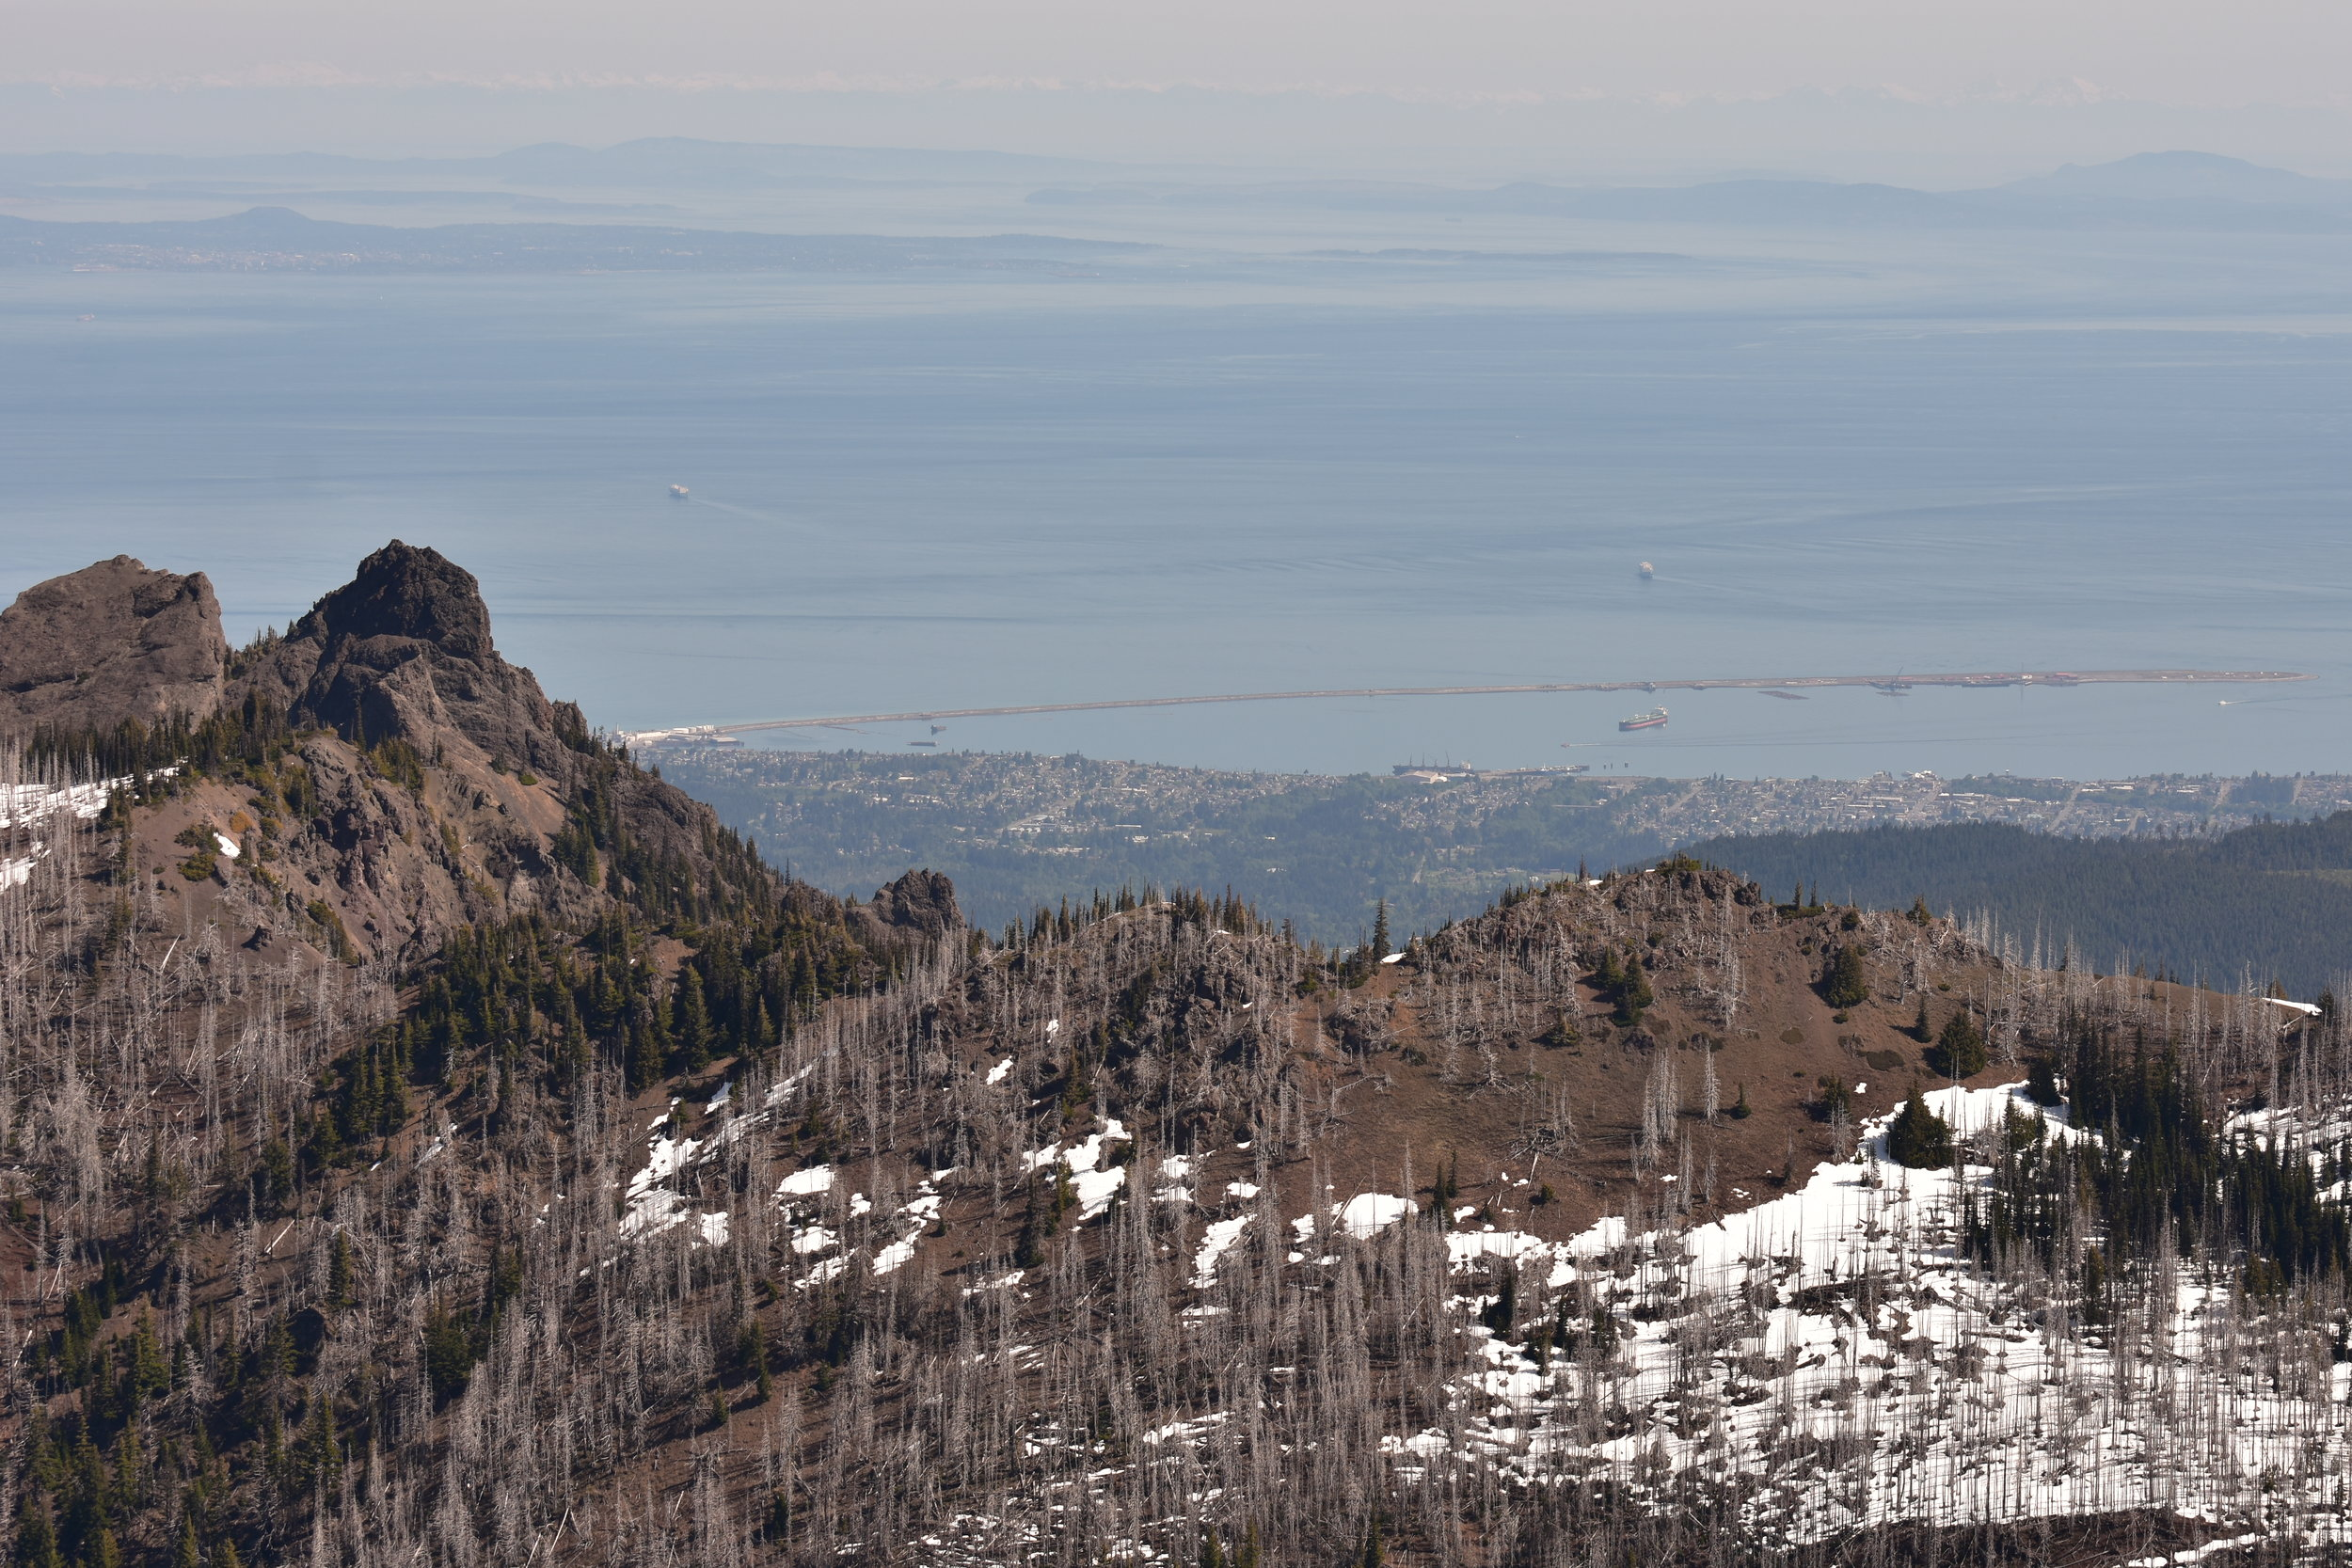 Nearest to Furthest: Unicorn Peak, Port Angeles, Victoria, Canadian Cascades